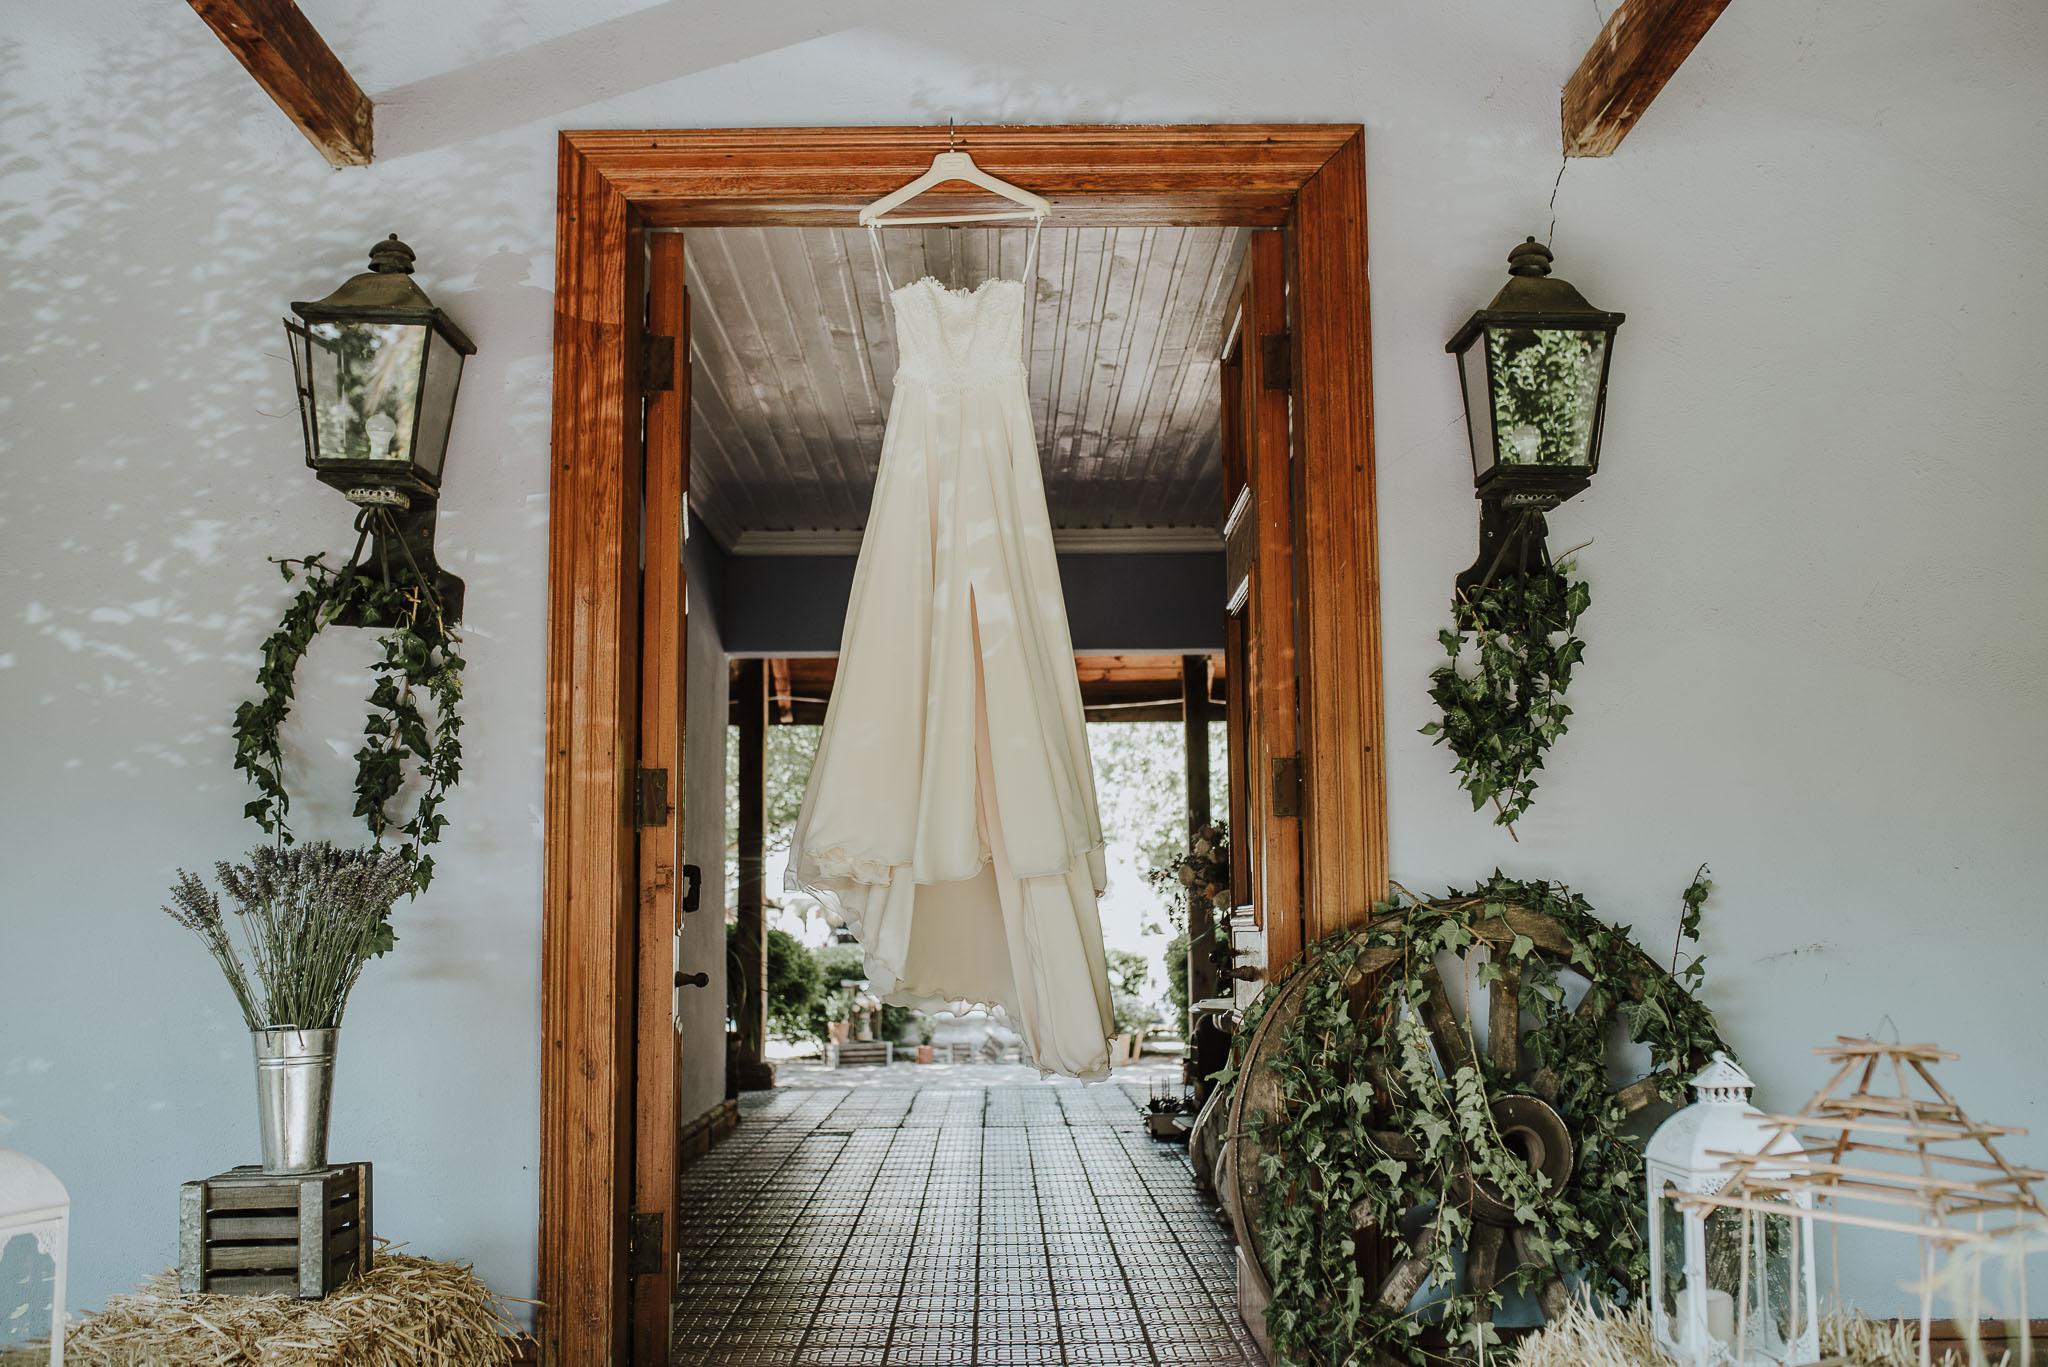 preparativos-novia-casa de campo fuller-vestido novia